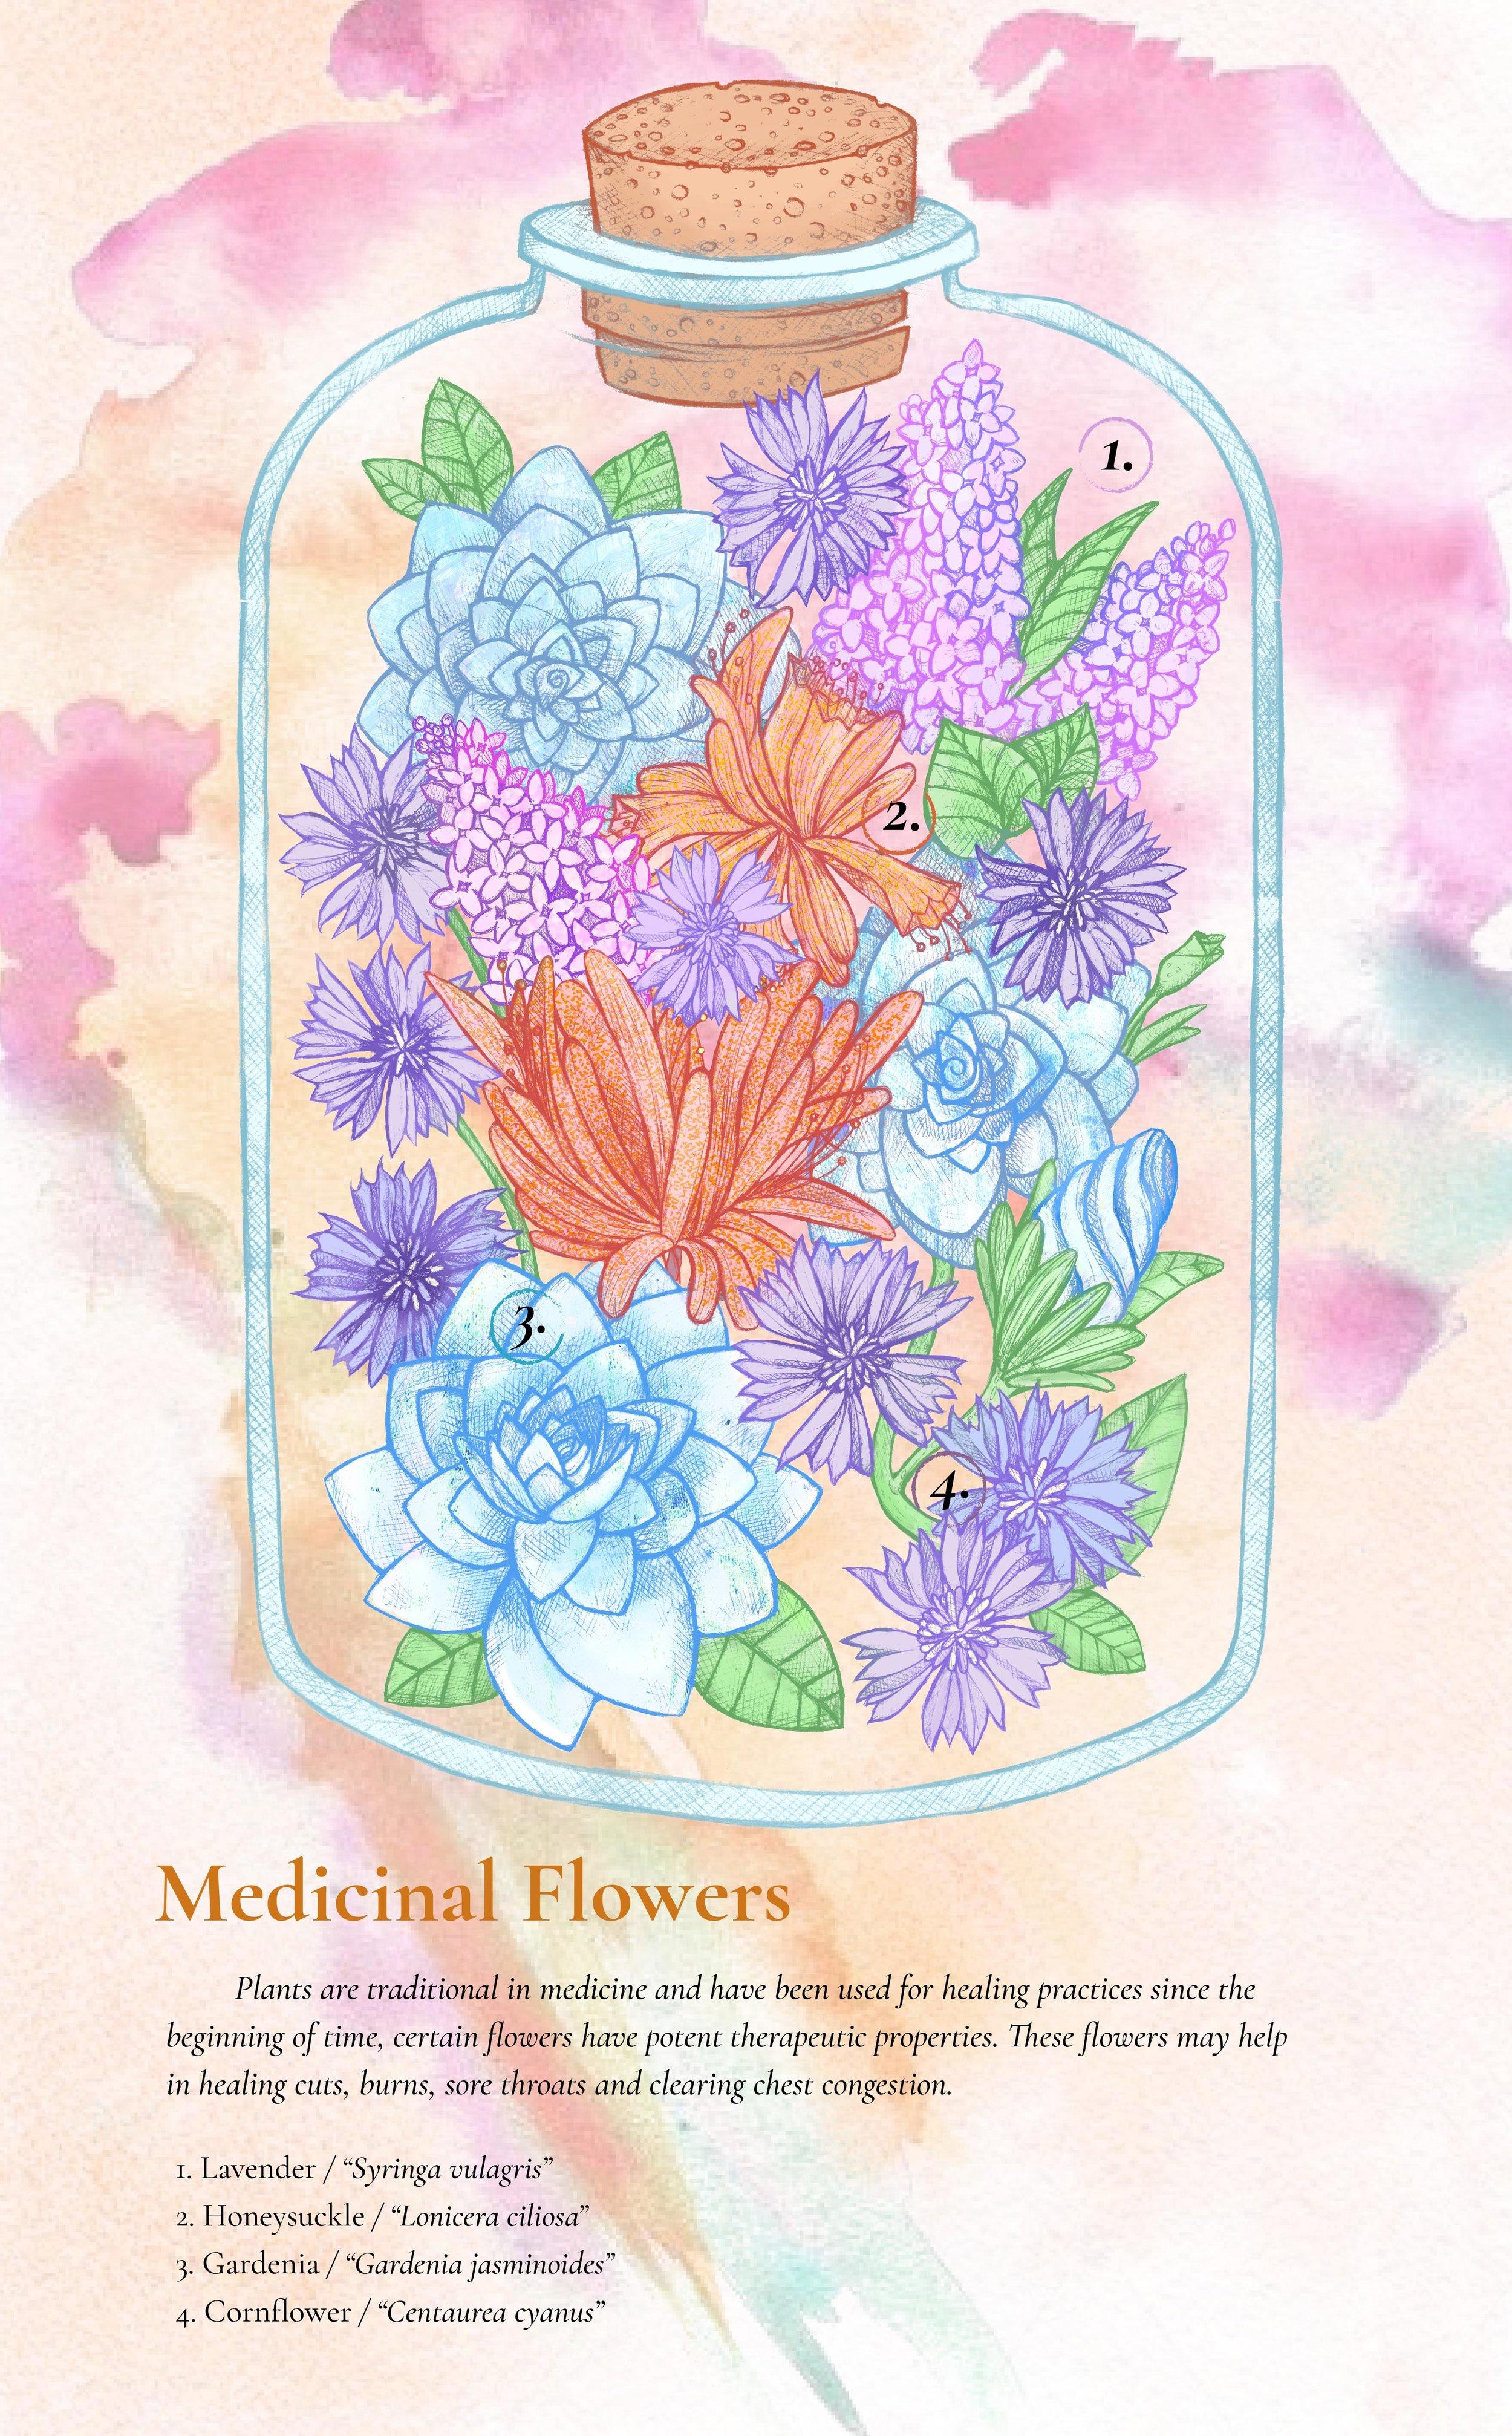 MedicinalBouquet_StephenMcdow1forweb.jpg